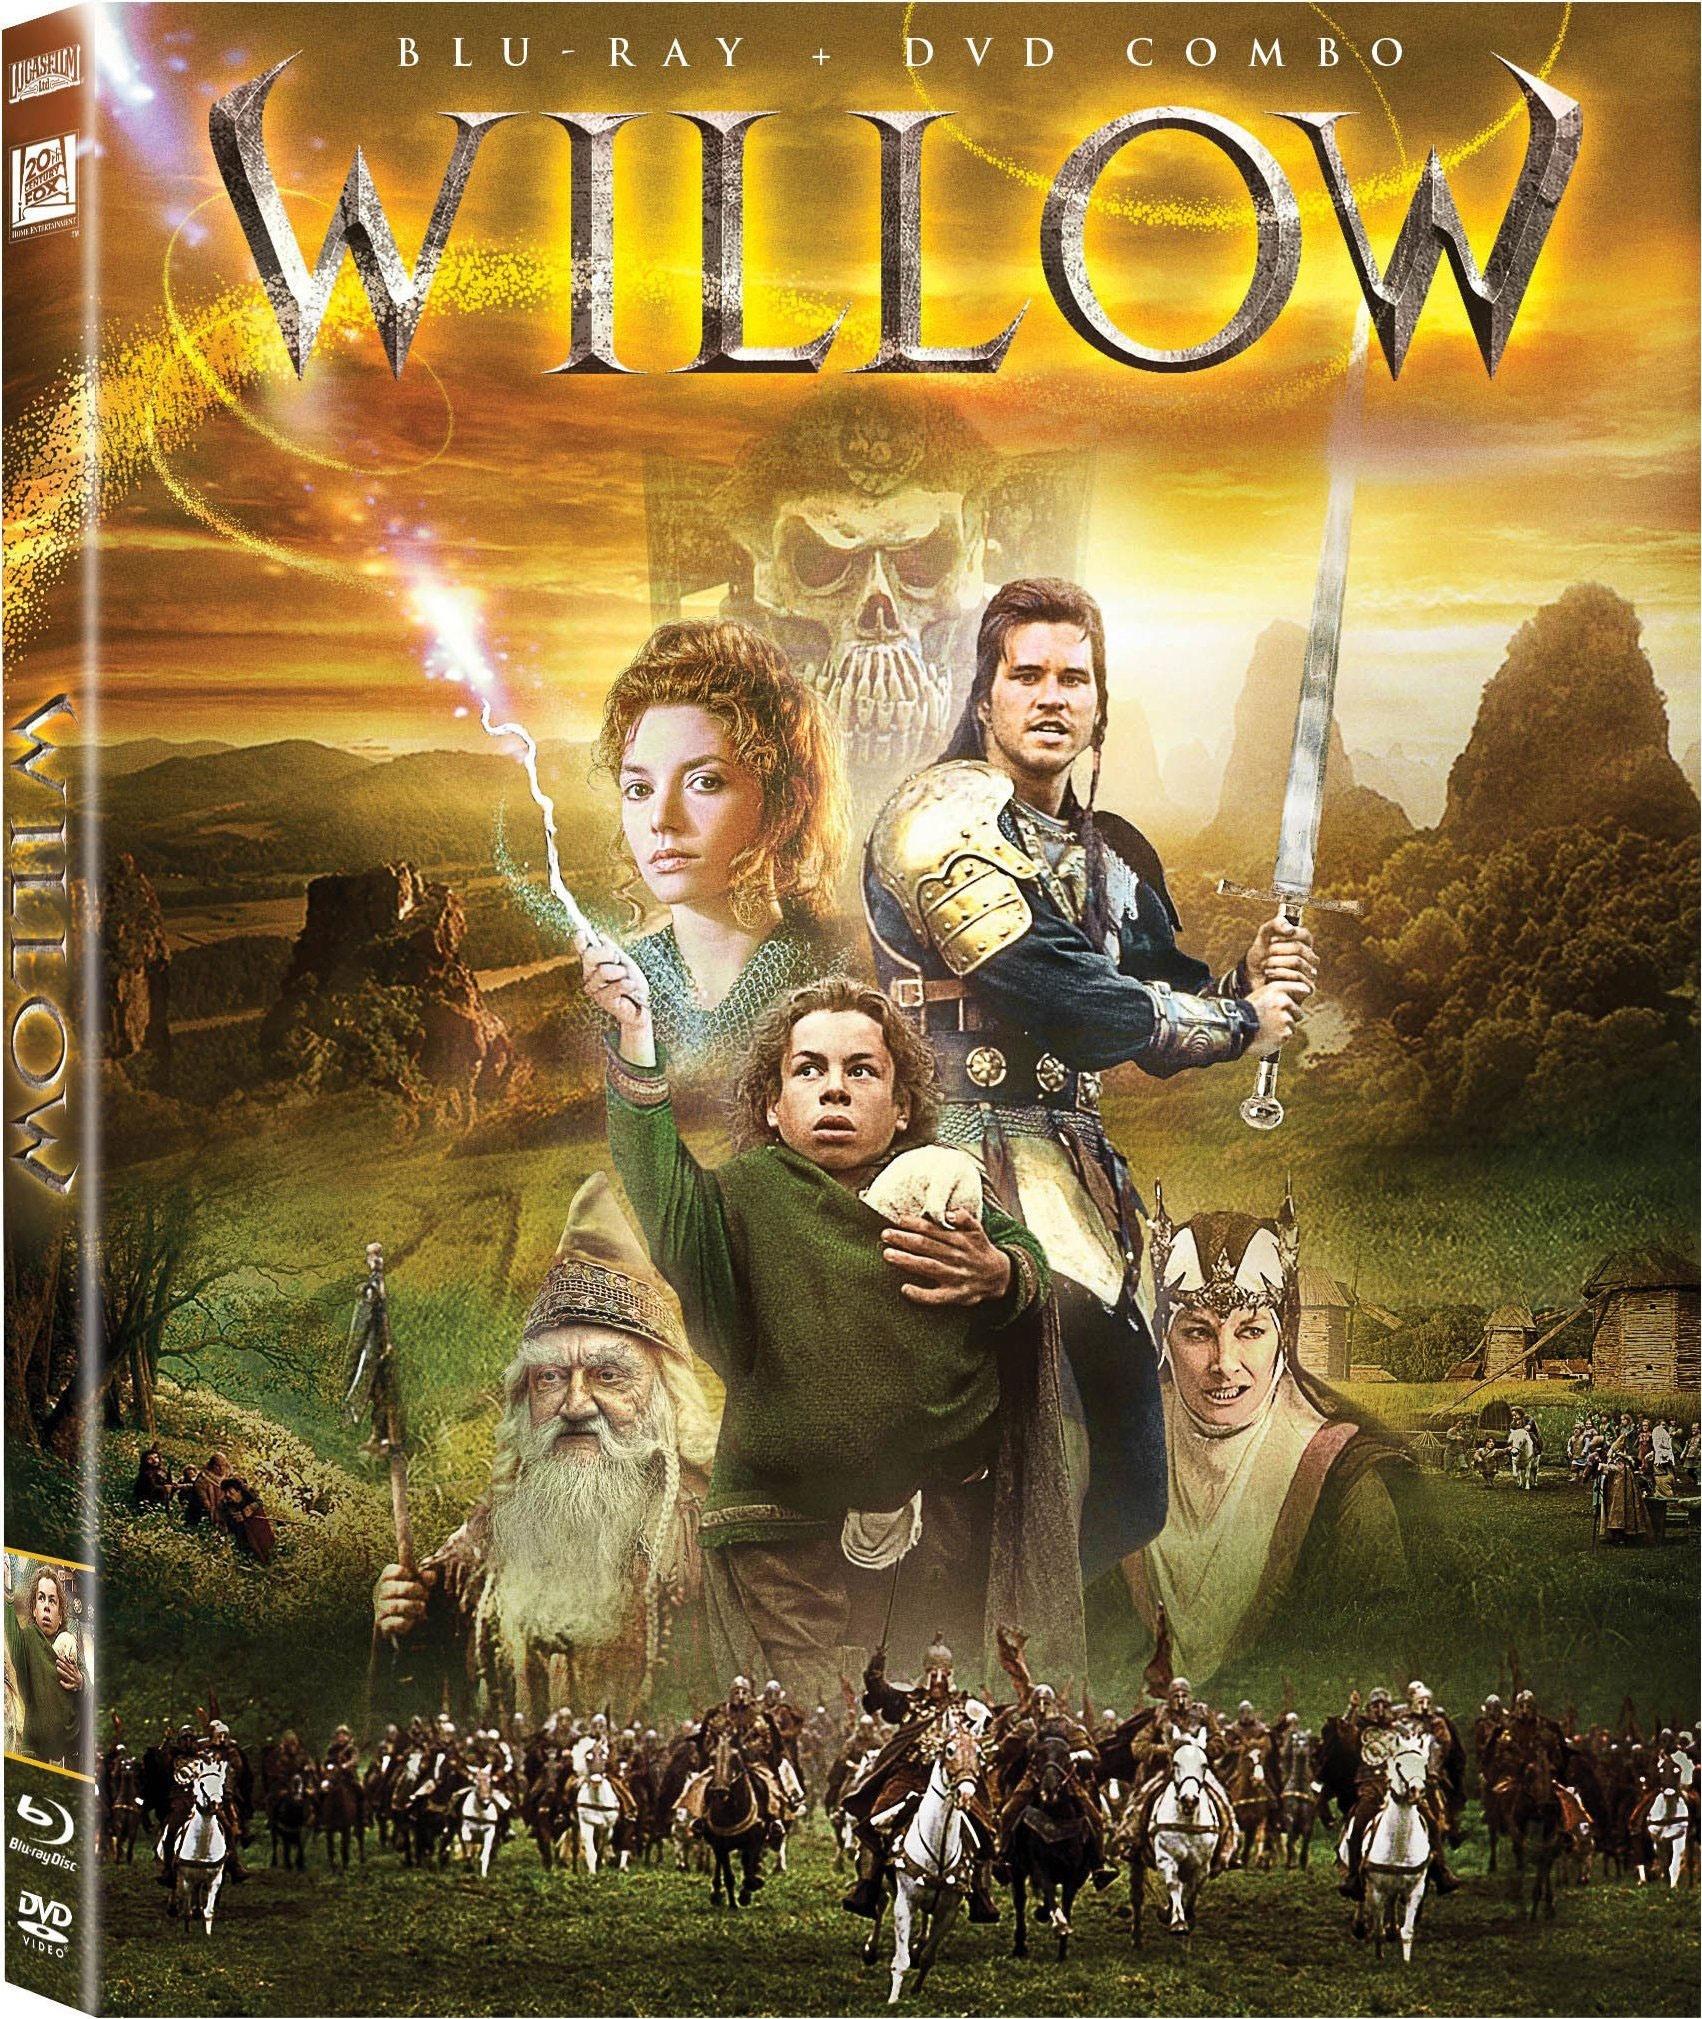 Willow (Blu-ray/DVD)